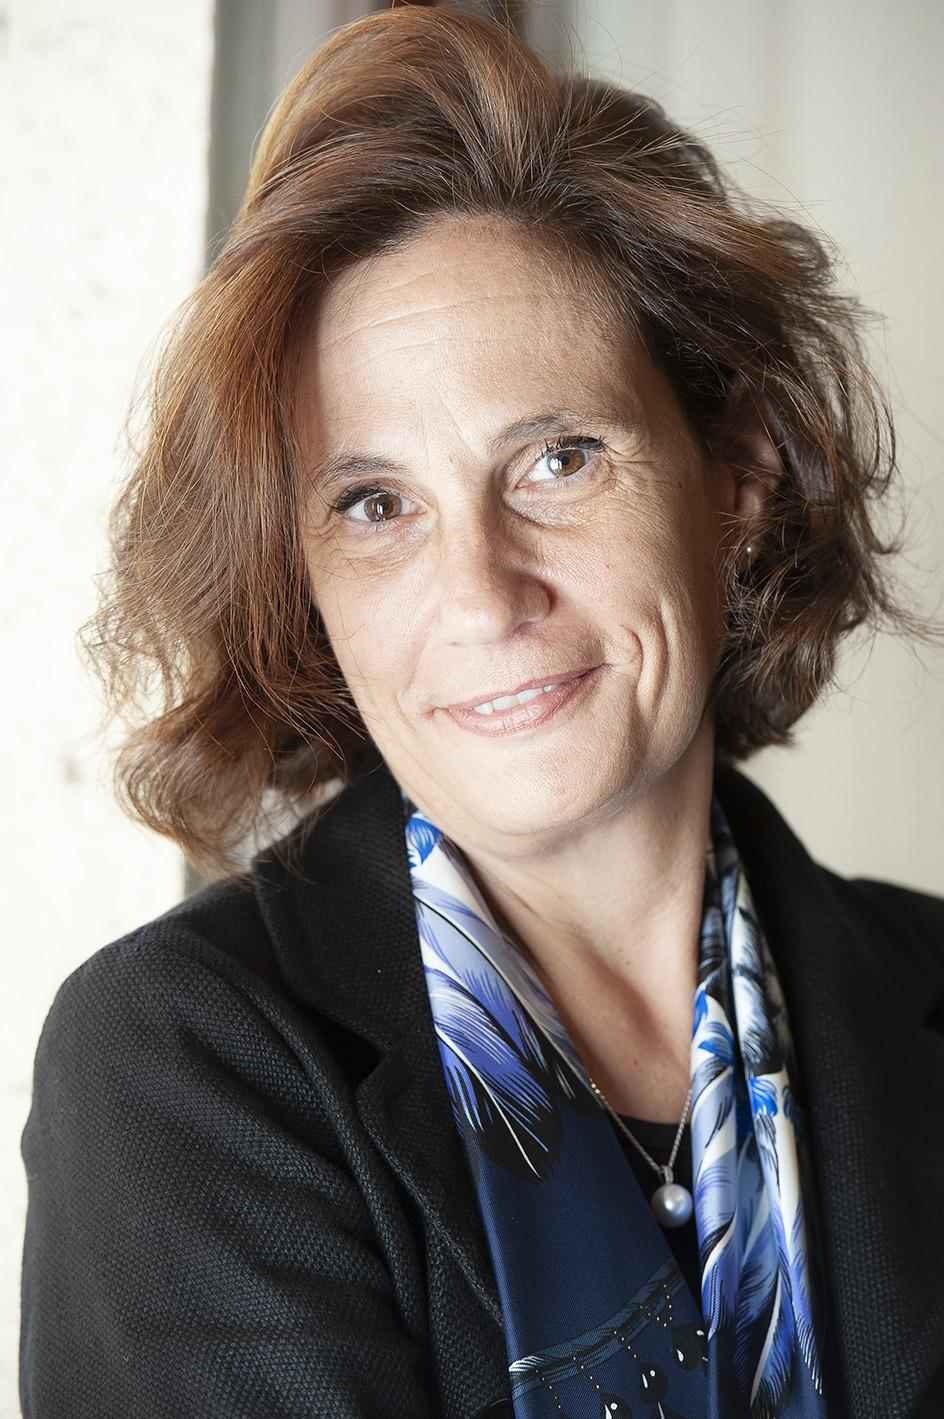 Ilaria Capua, DVM, PhD, PhD H.C. University of Florida